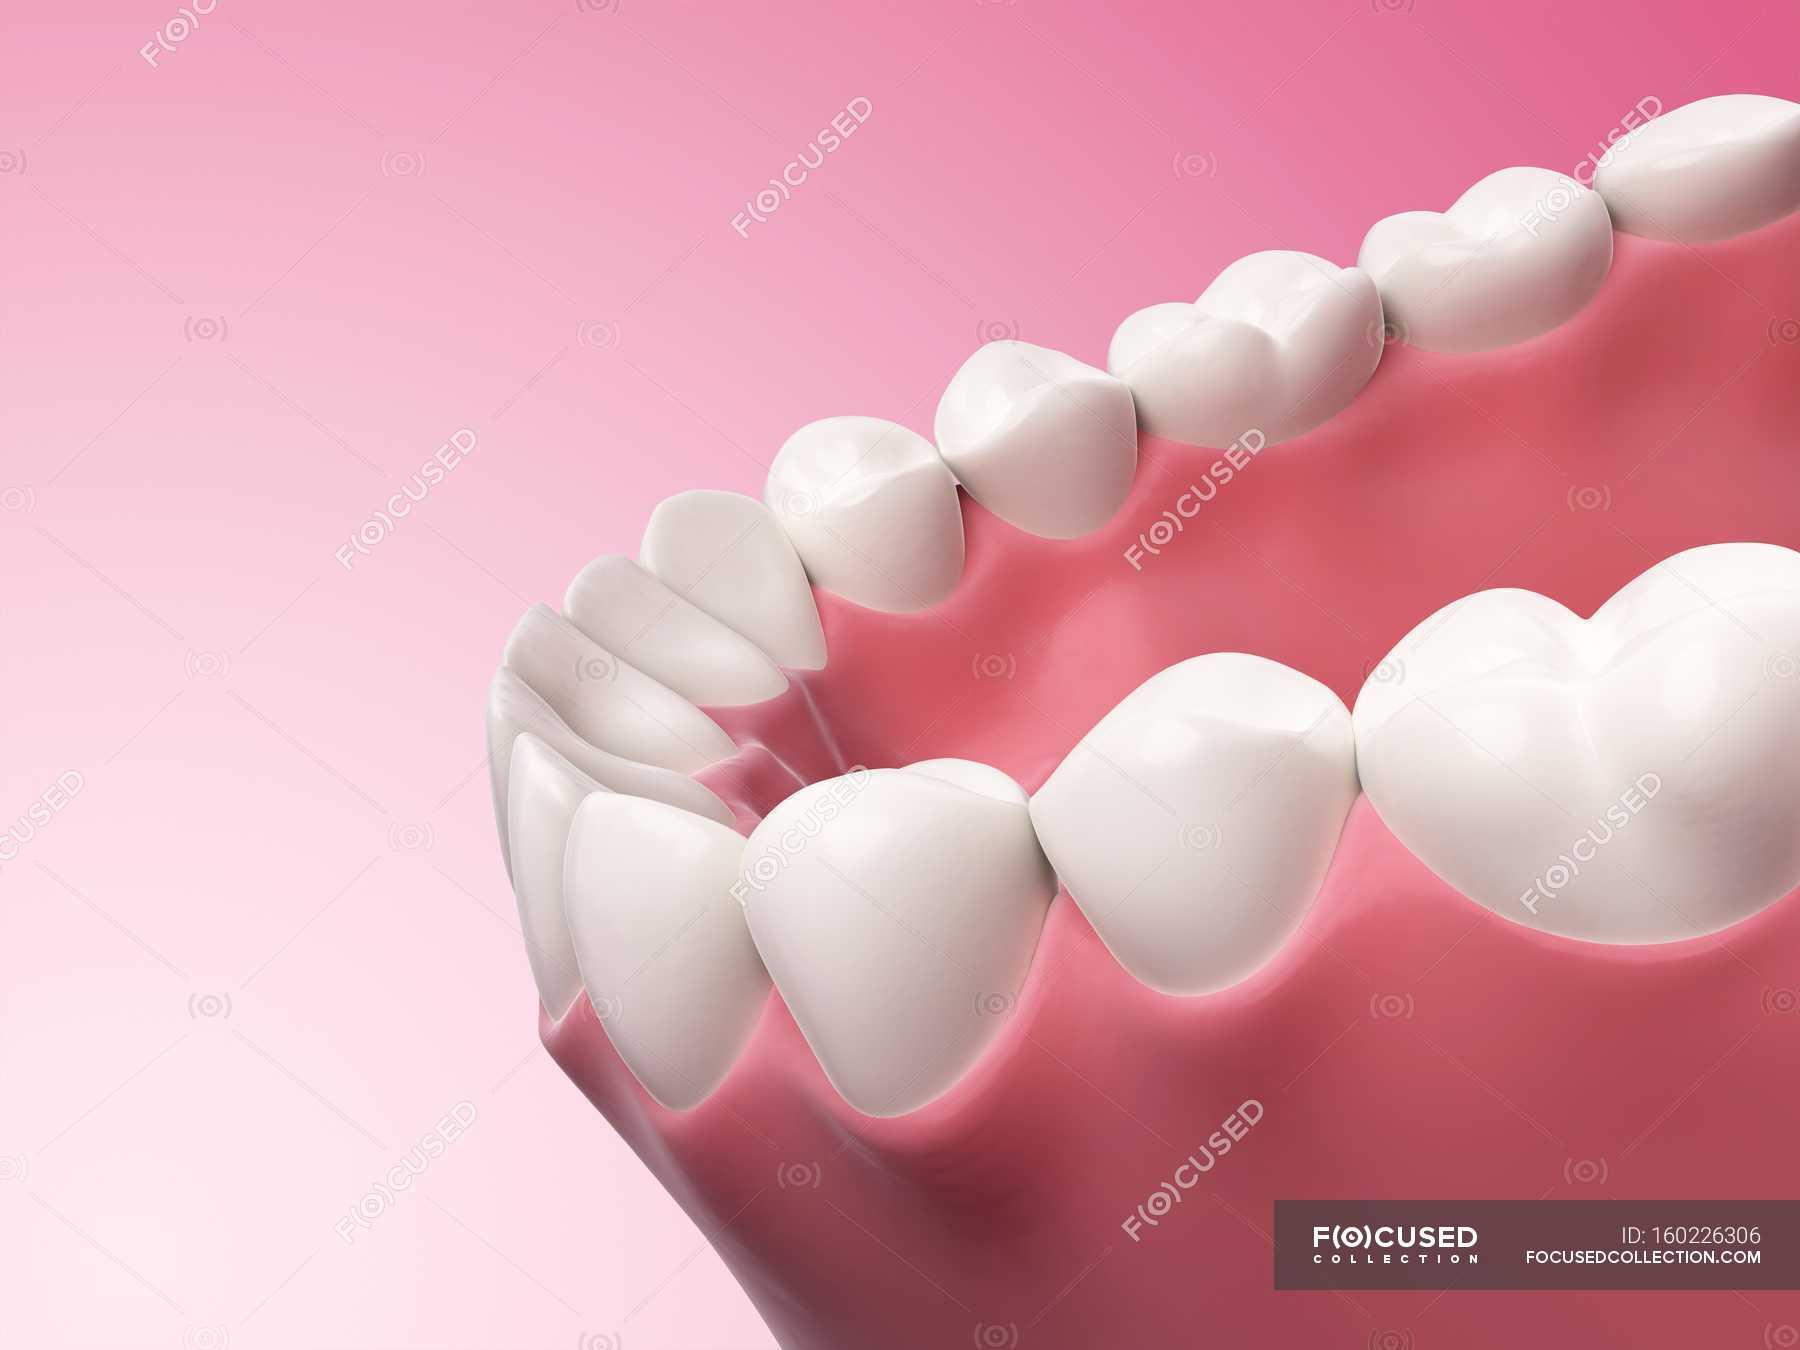 Human Teeth Anatomy Pink Background Dental Care Stock Photo